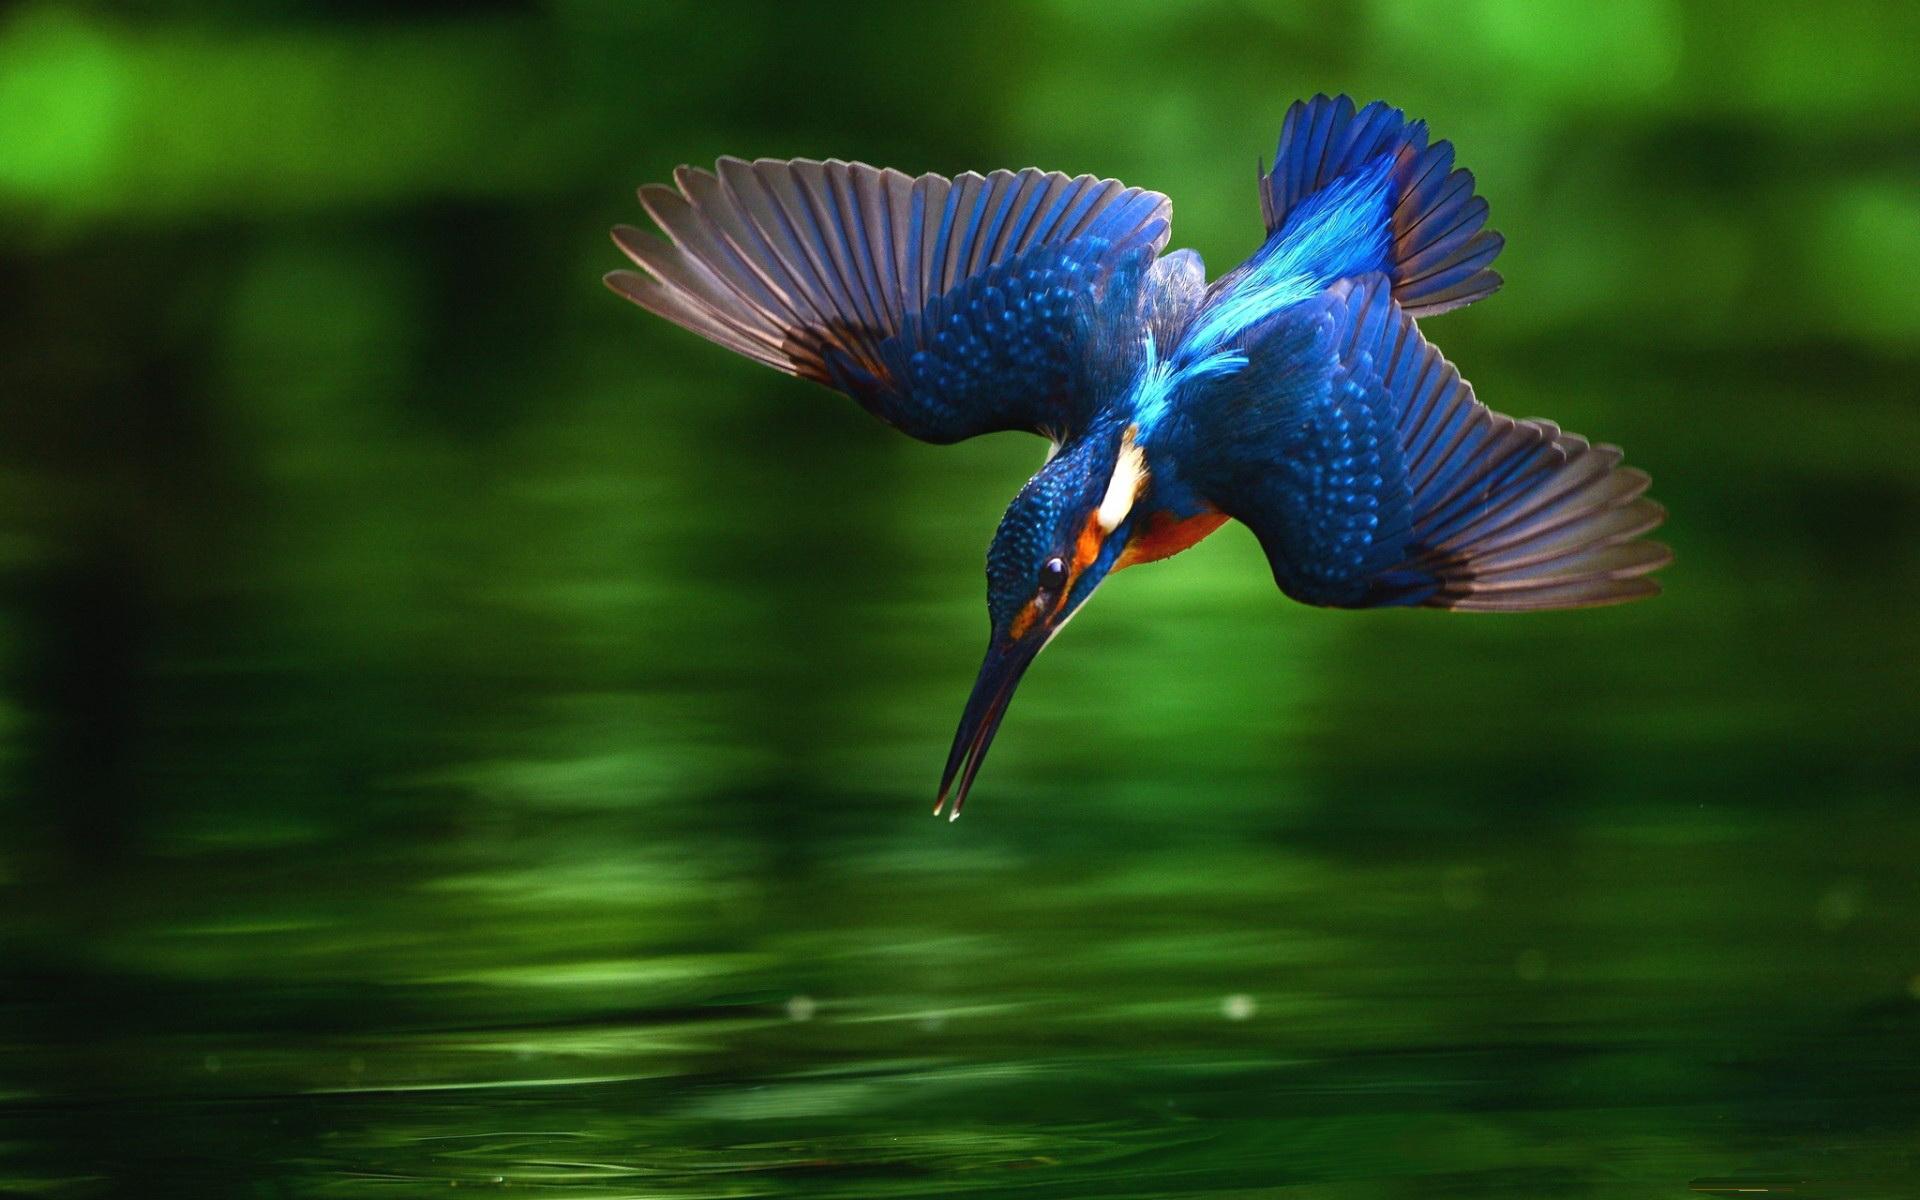 14 Hd Kingfisher Bird Wallpapers